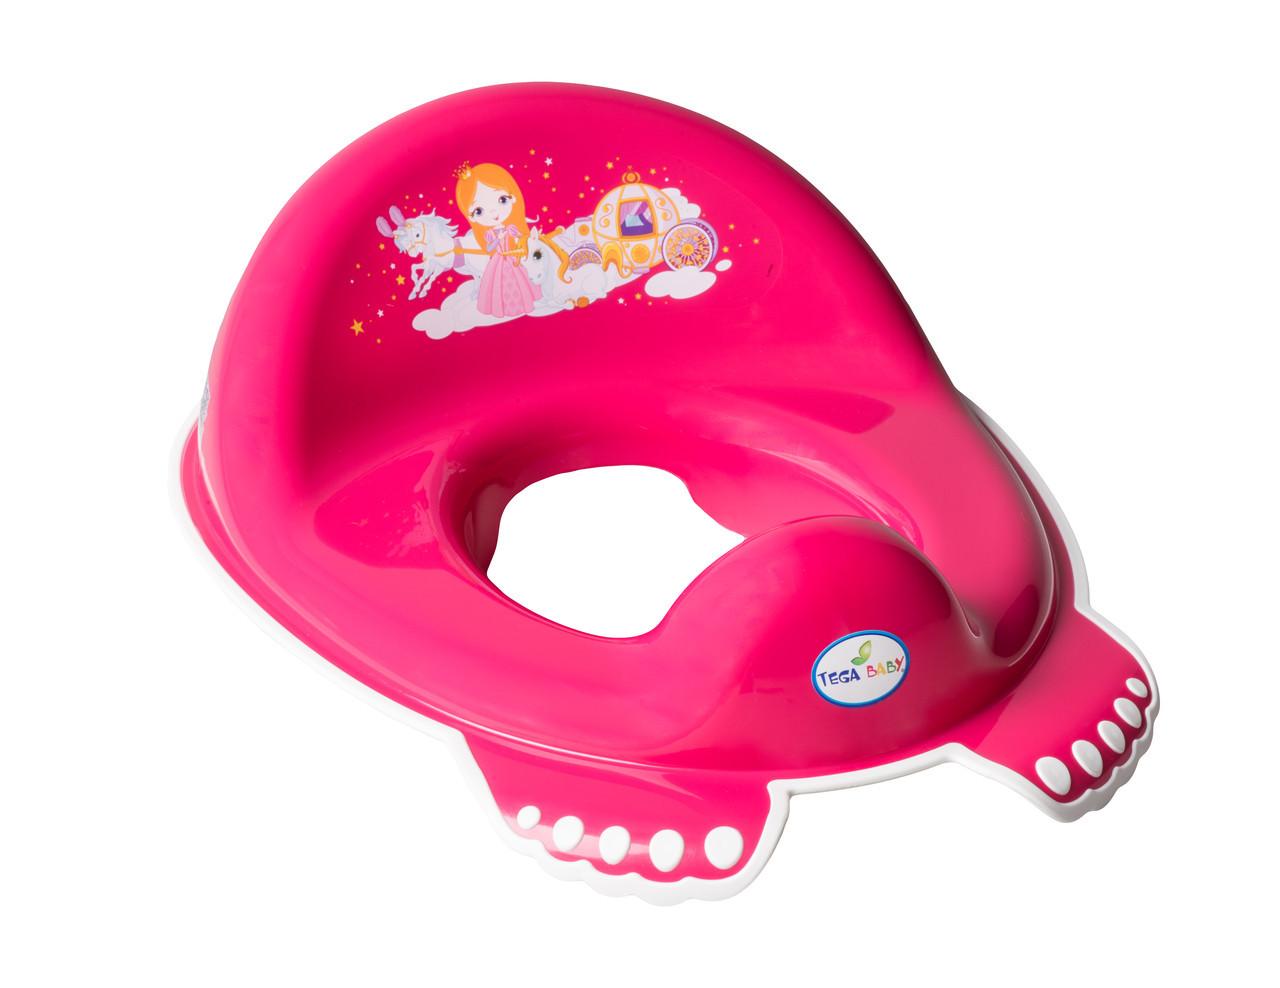 Накладка на унитаз нескользящая Tega Little Princess Розовый